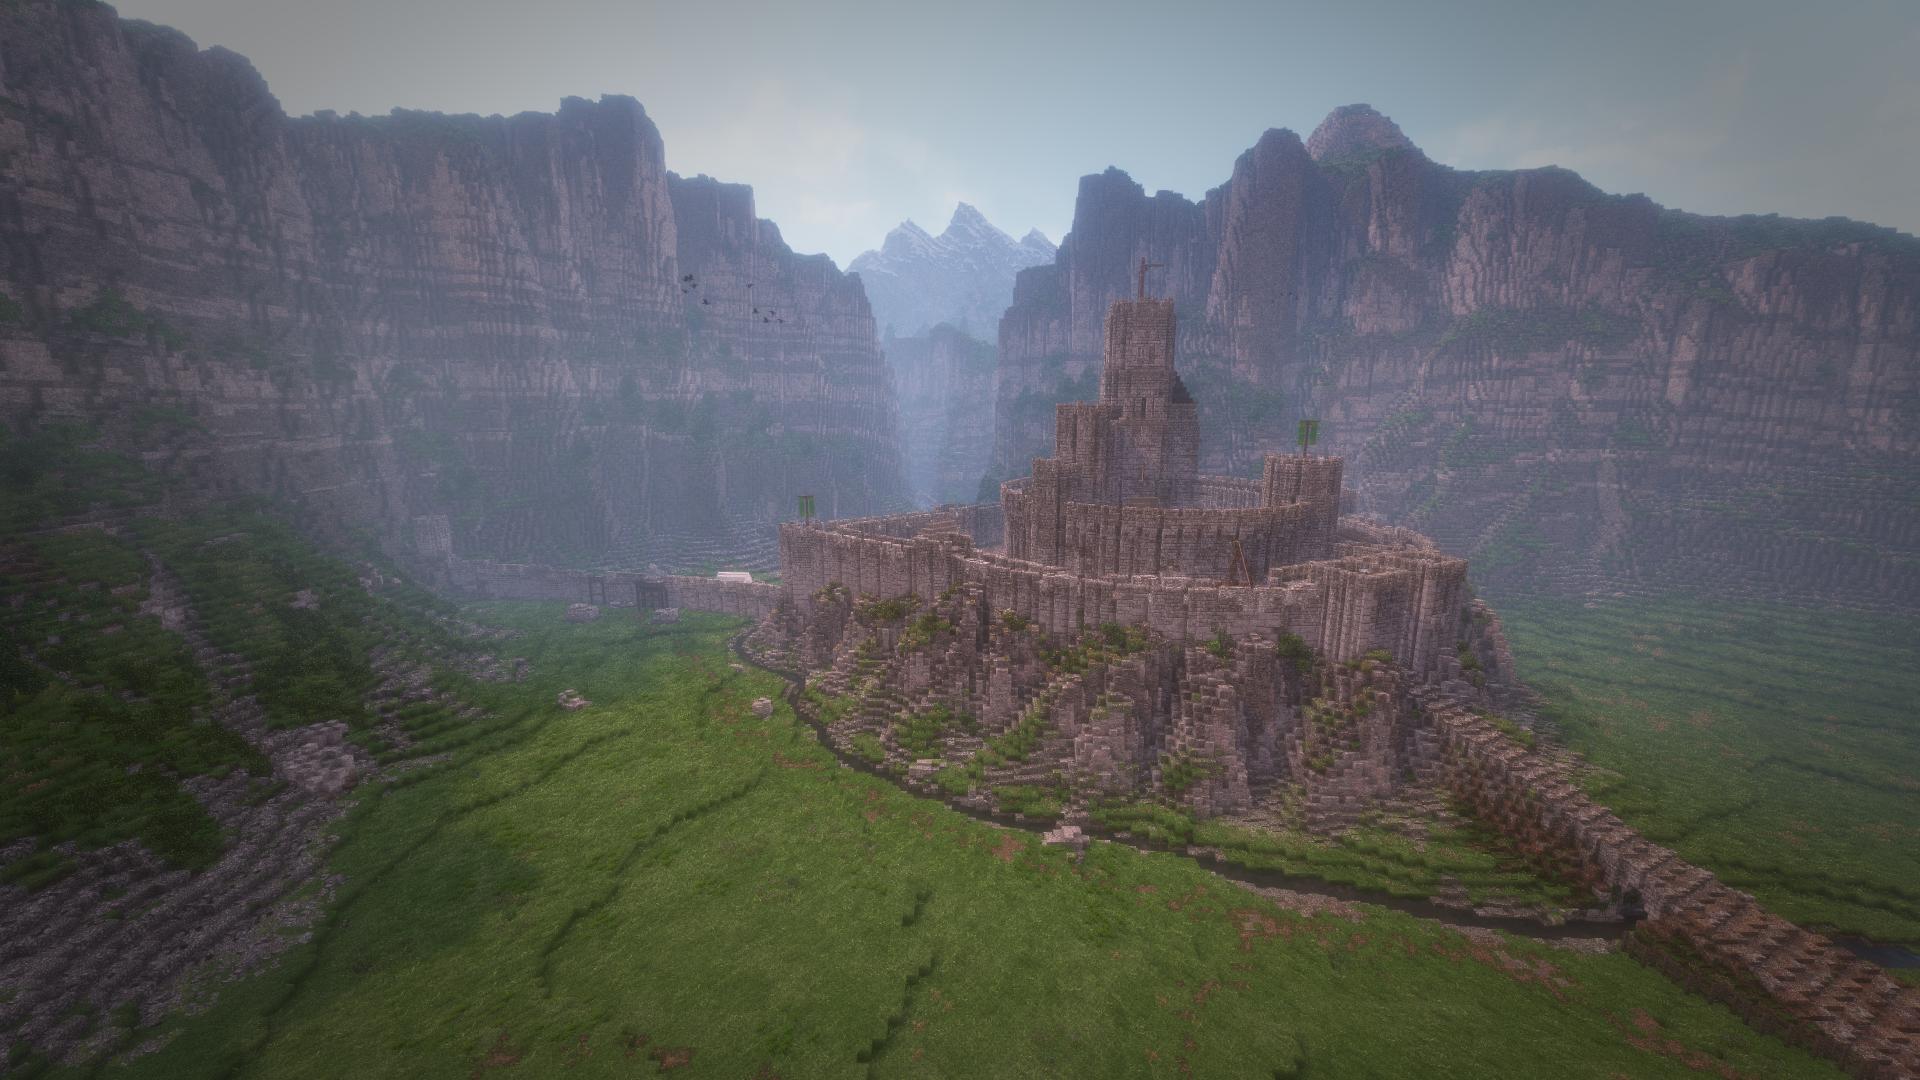 The Hornburg, based on Tolkien's mudmap of Helms Deep